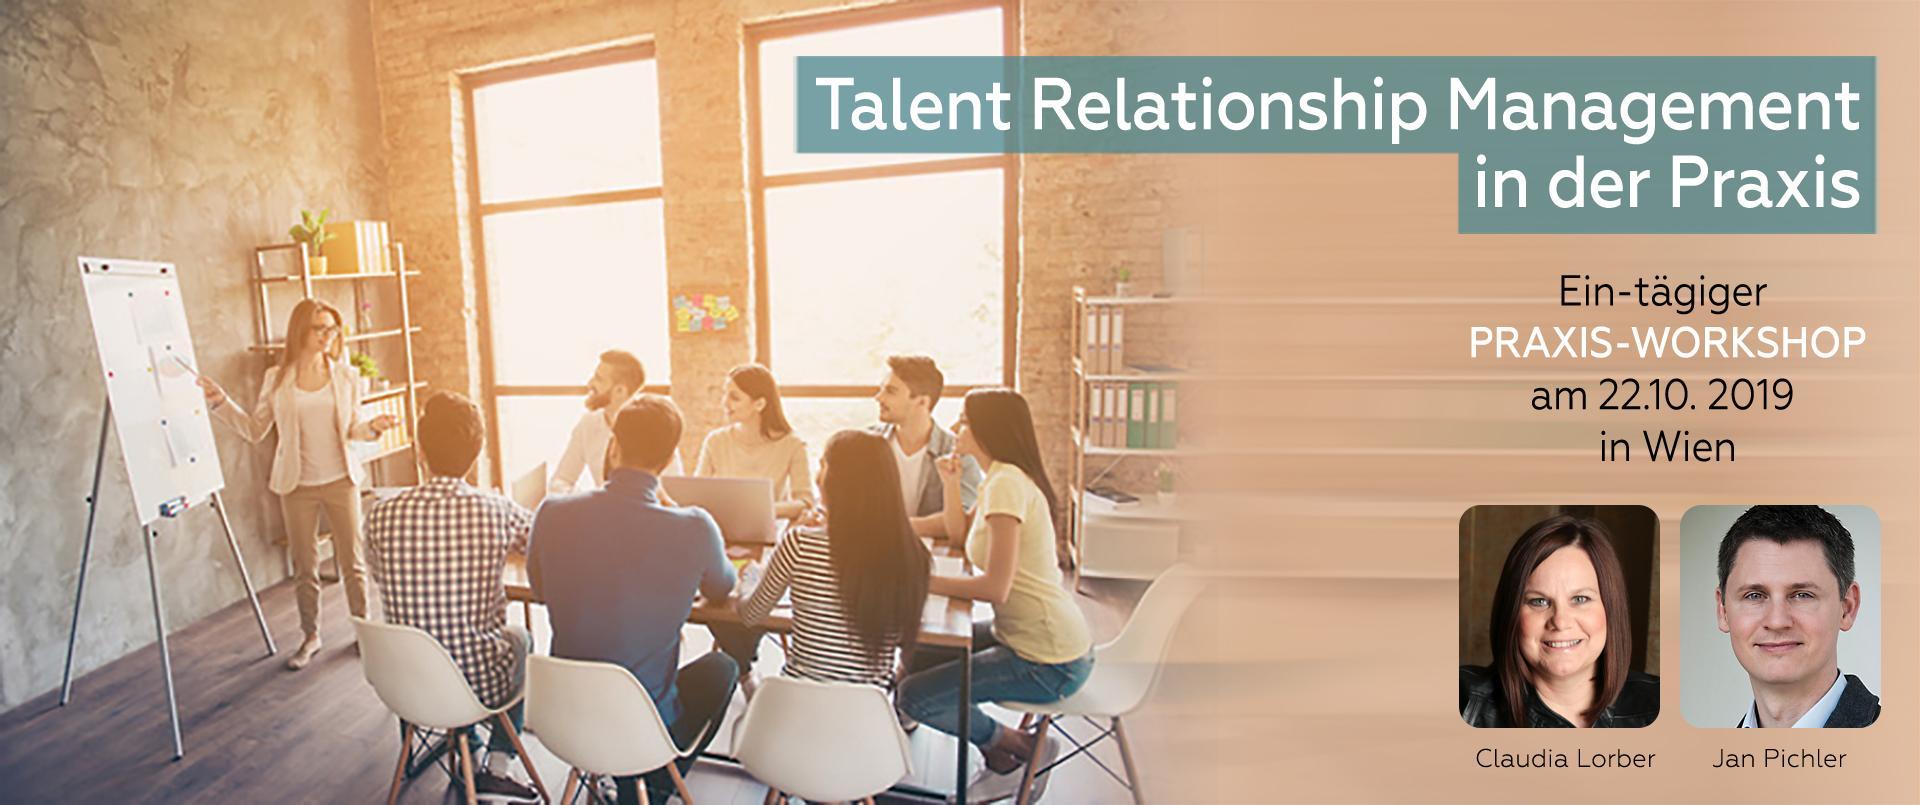 Talent Relationship Management in der Praxis